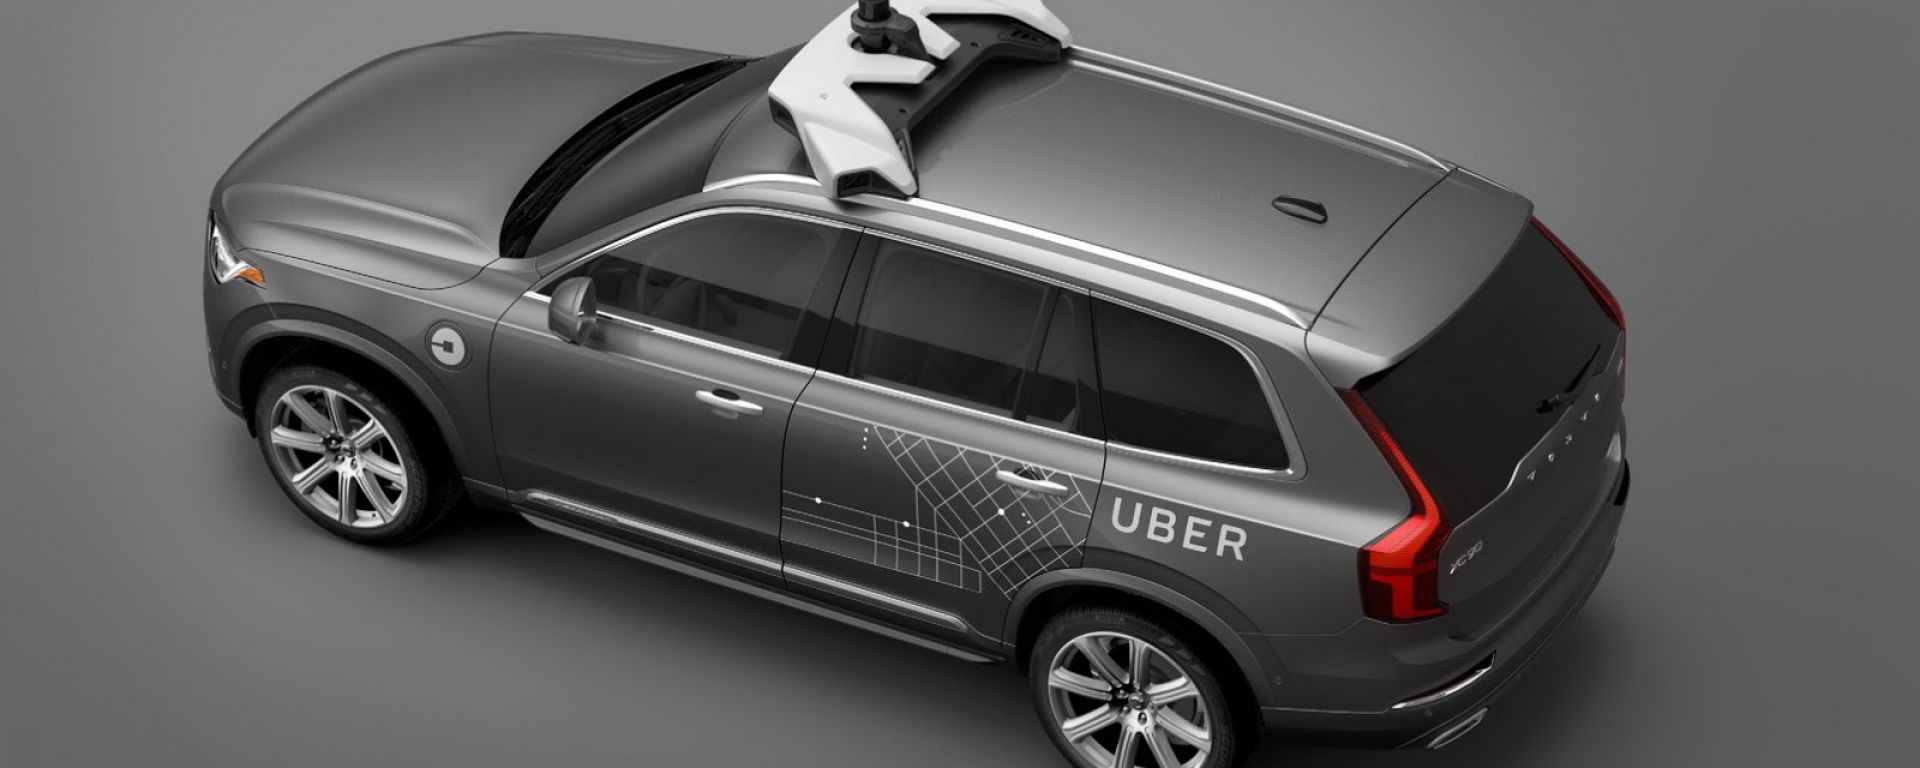 Volvo e Uber, partnership per la guida autonoma